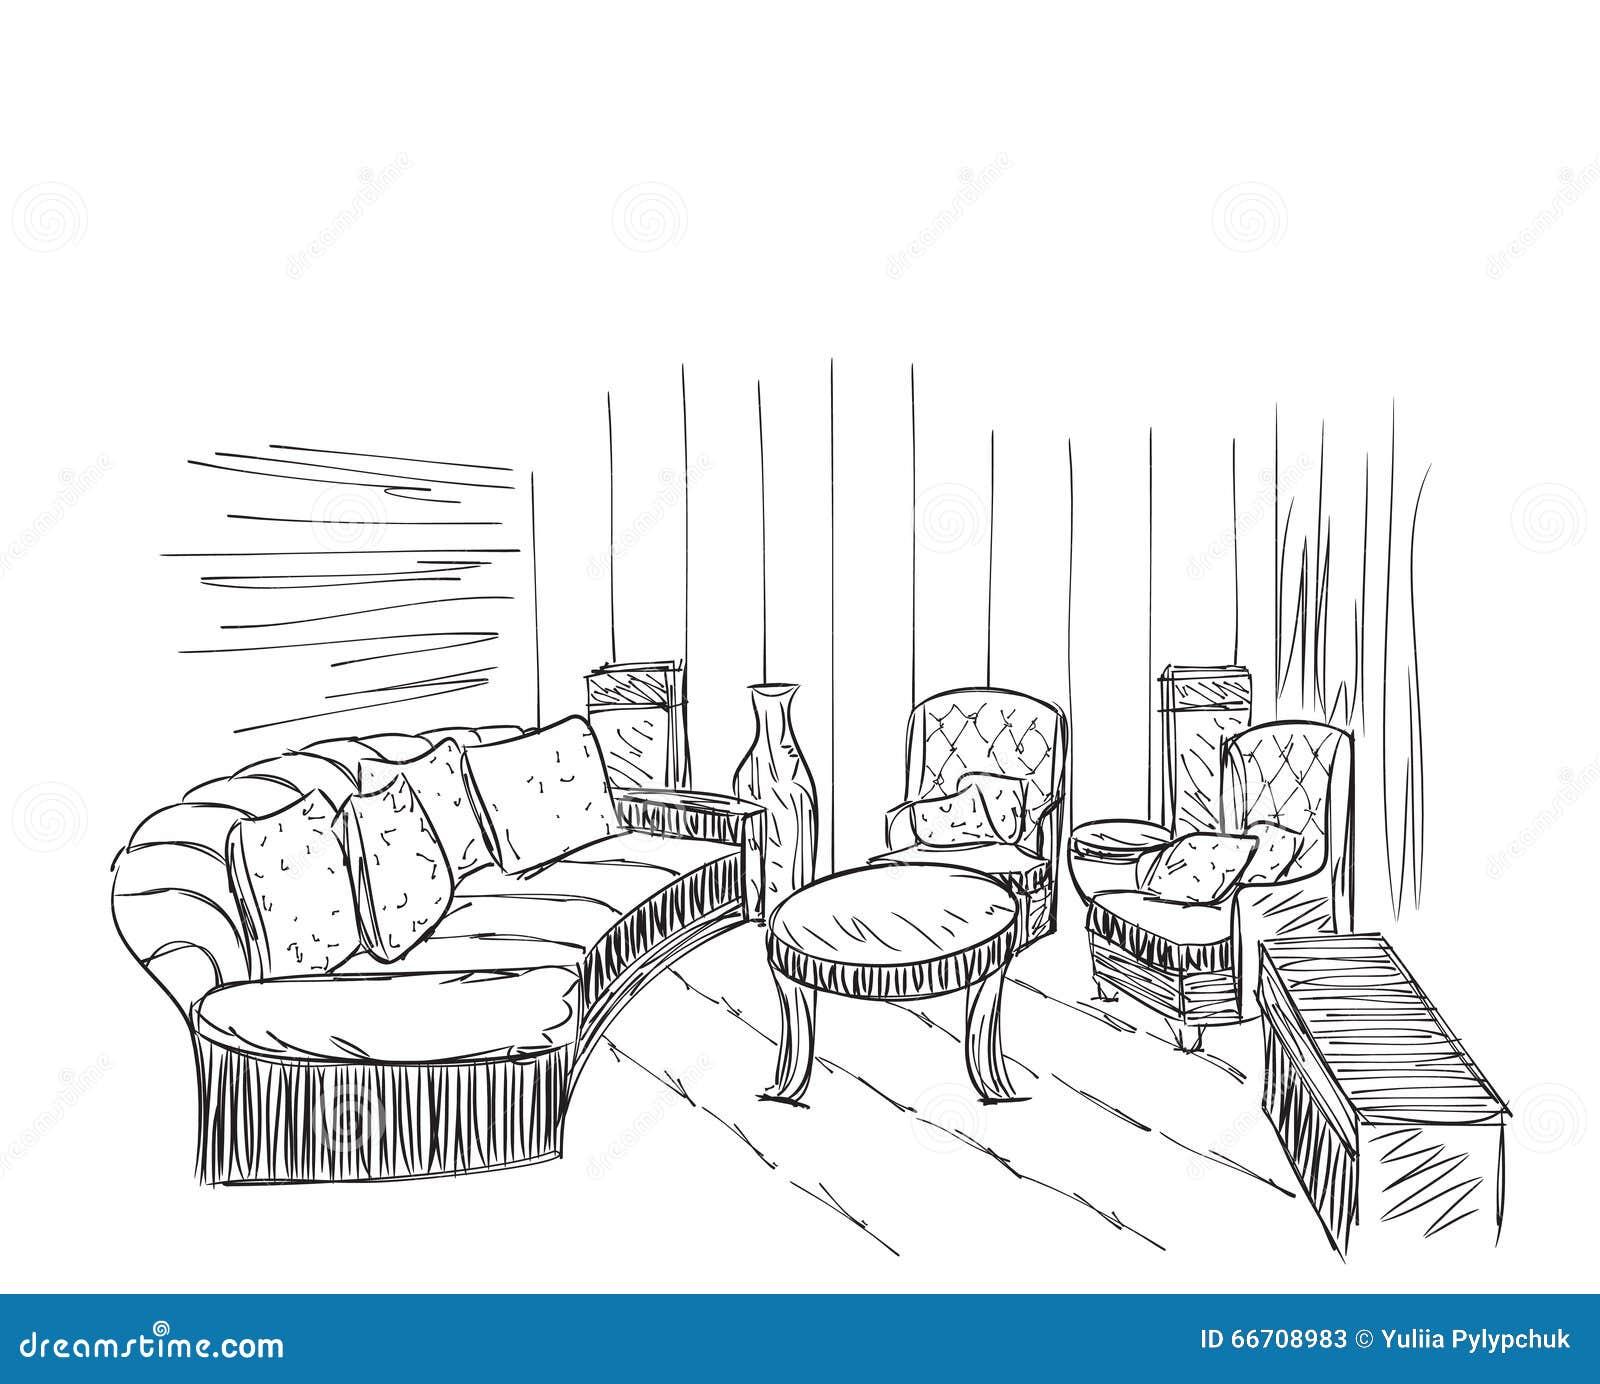 Modern Interior Room Sketch. Hand Drawn Furniture. Vector